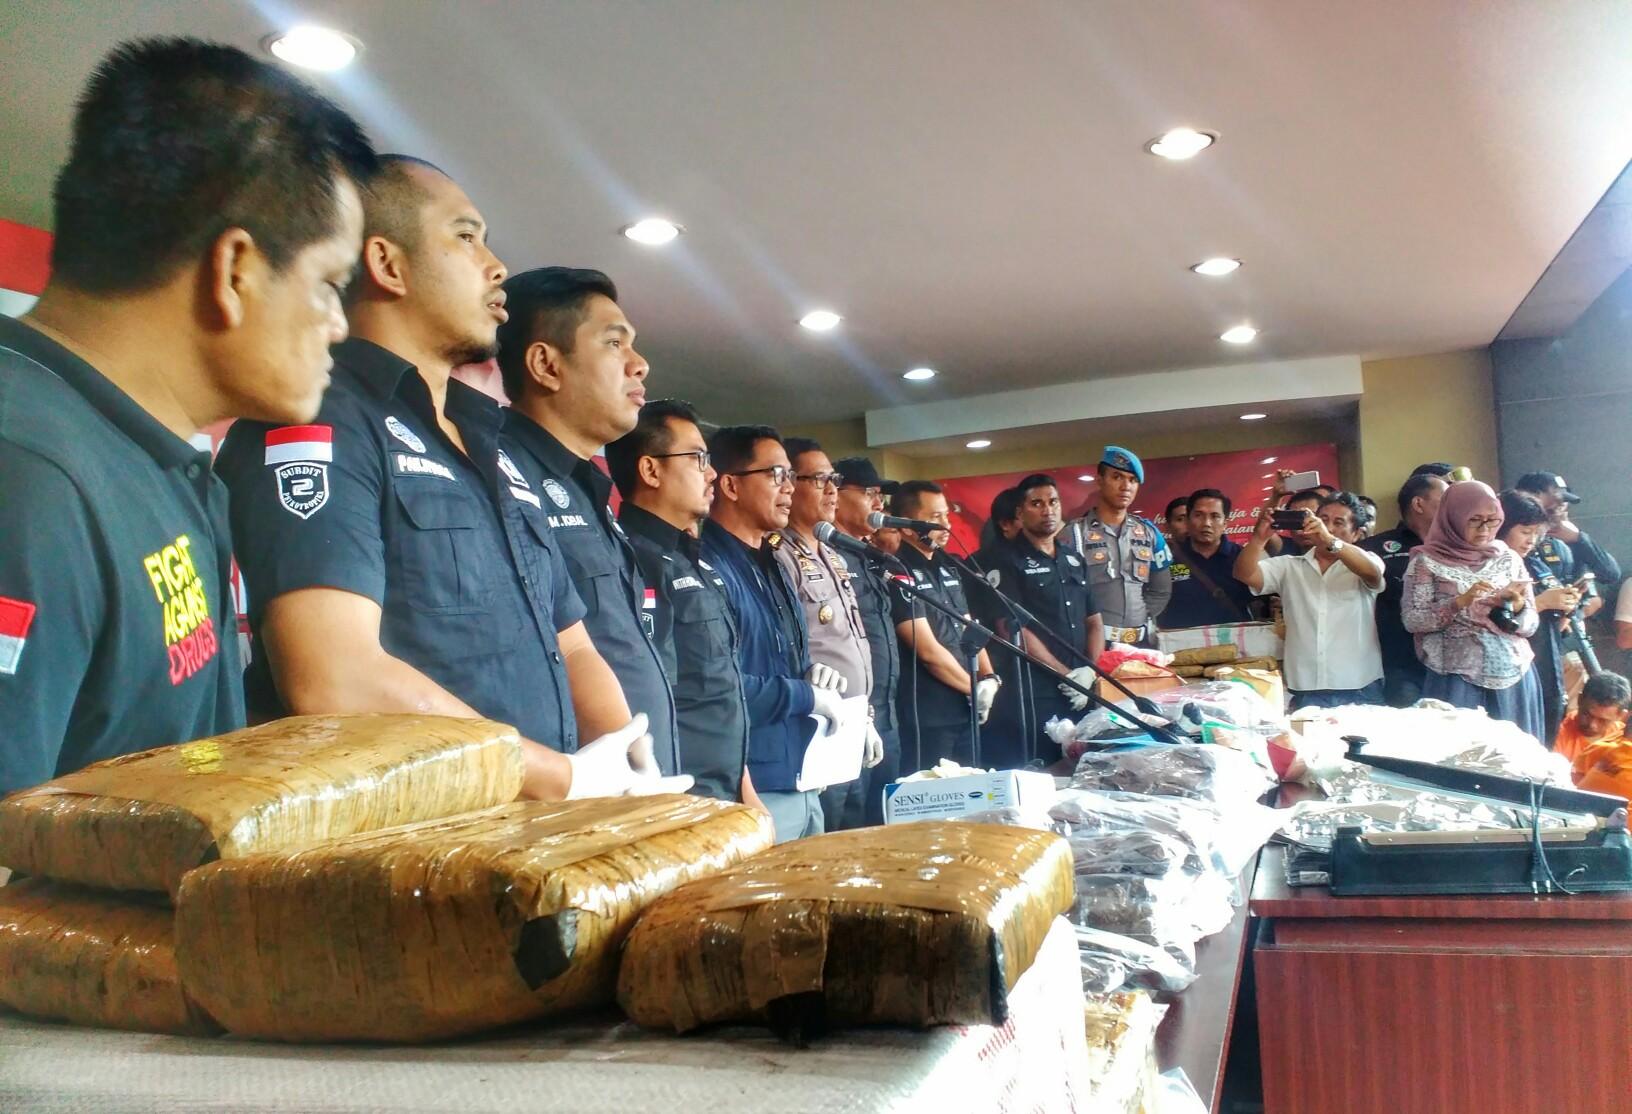 Barang bukti narkoba dalam rilis Operasi Nila Jaya 2017. (Tama)